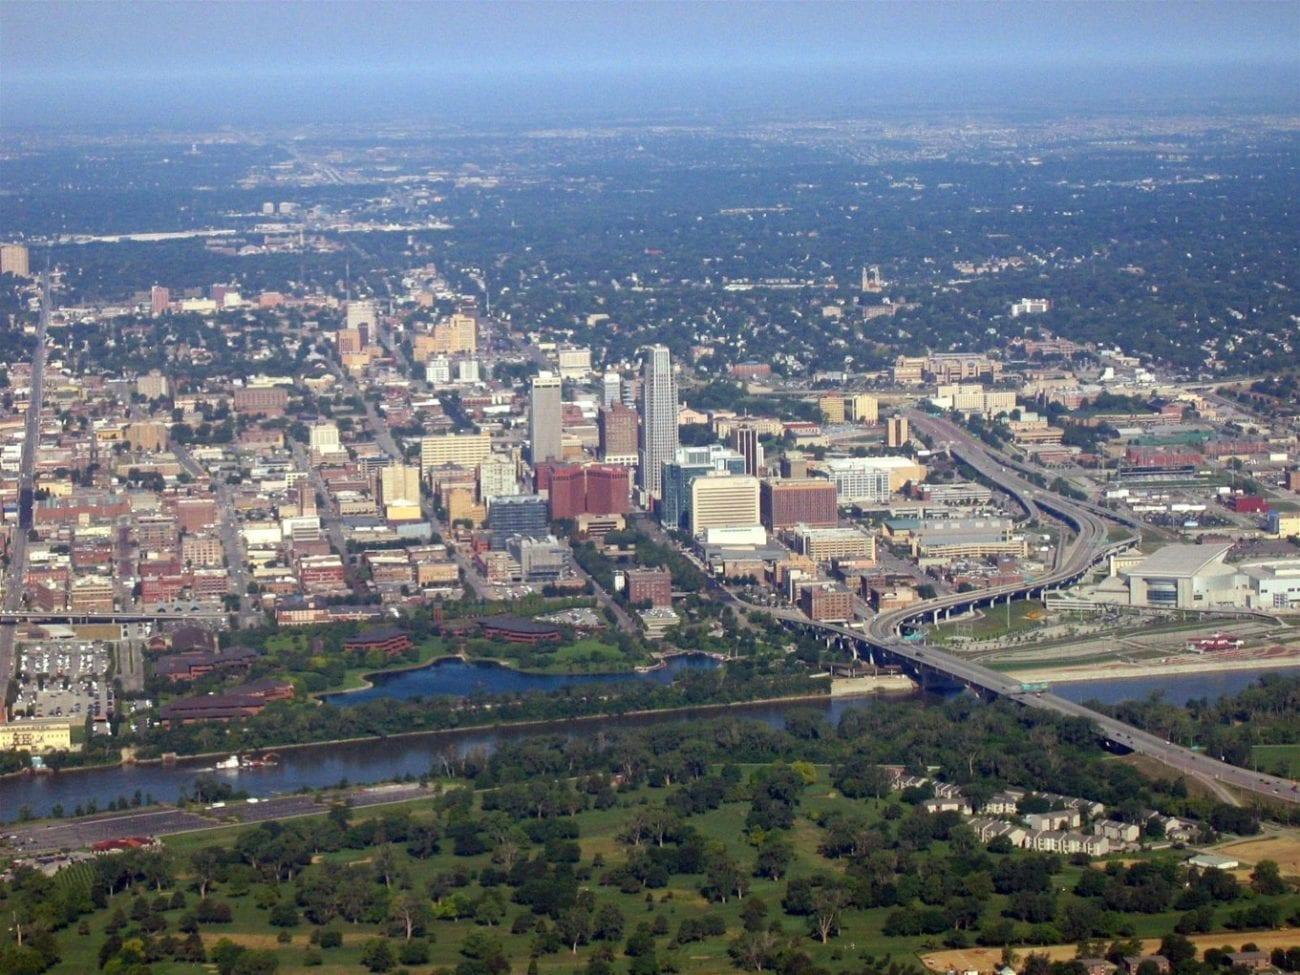 Caesars strikes deal to build and operate Harrah's Nebraska casino